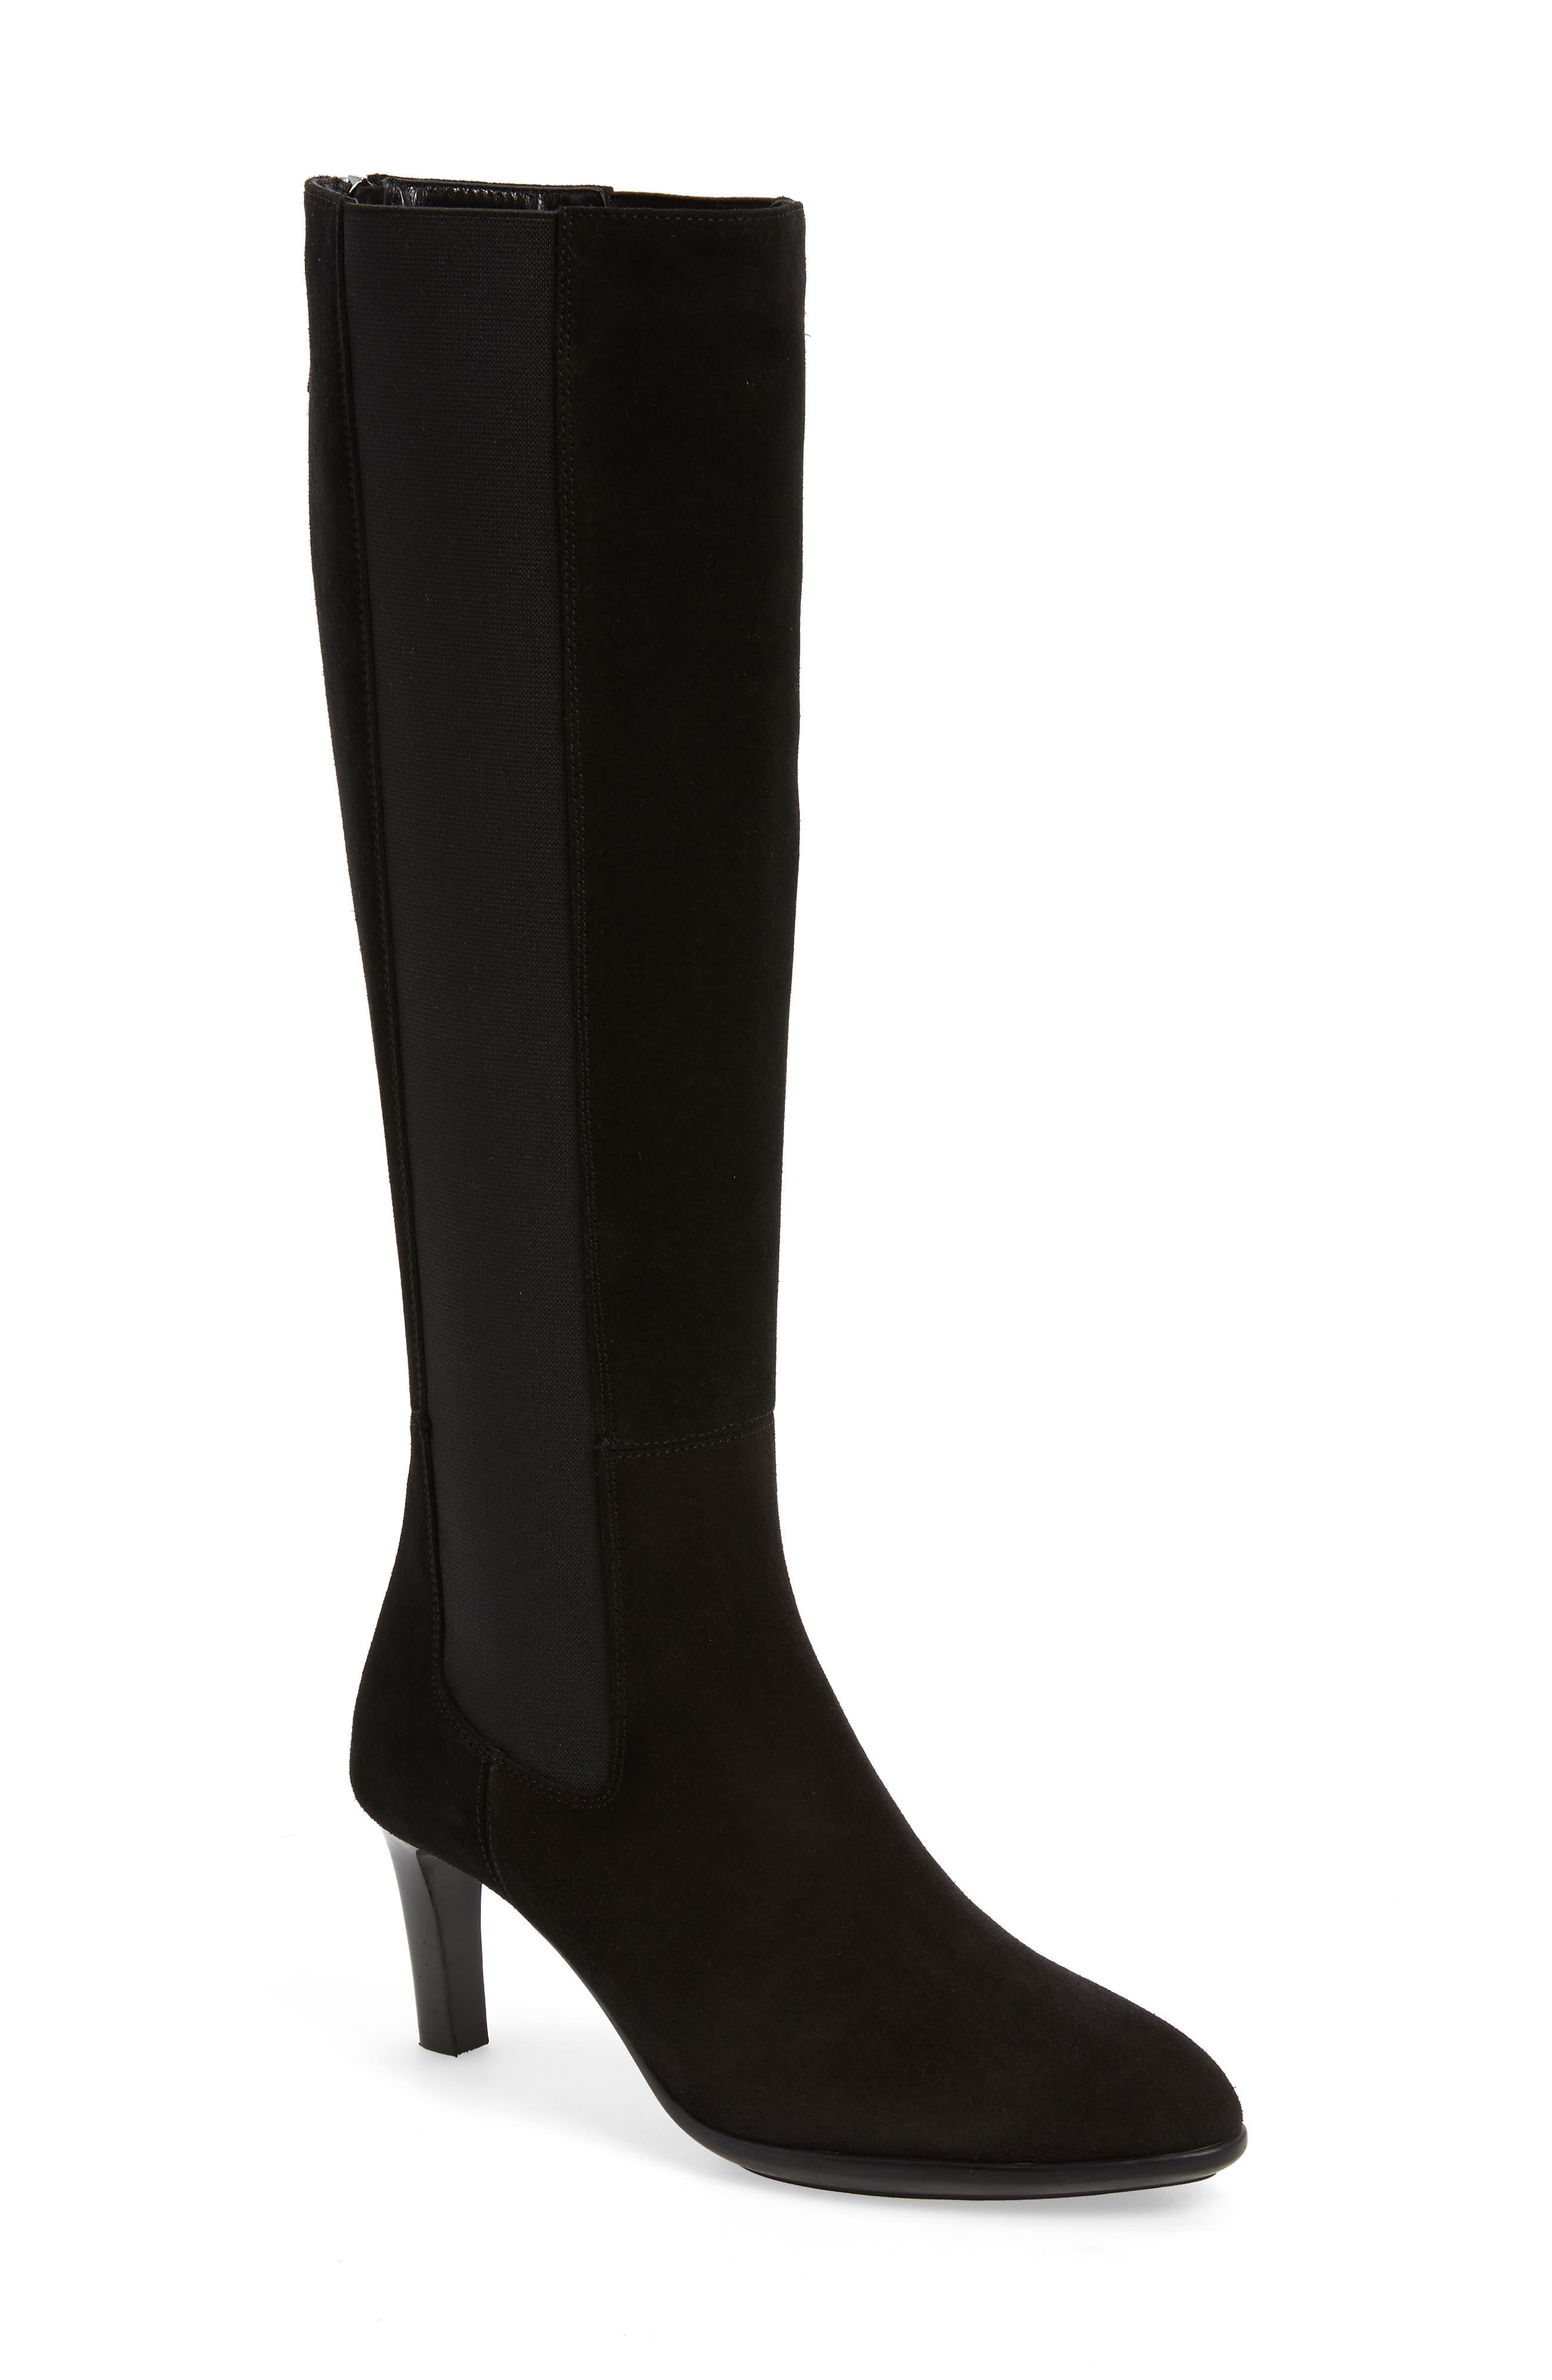 AQUATALIA, Dahliana Weatherproof Knee High Boot, Main thumbnail 1, color, BLACK